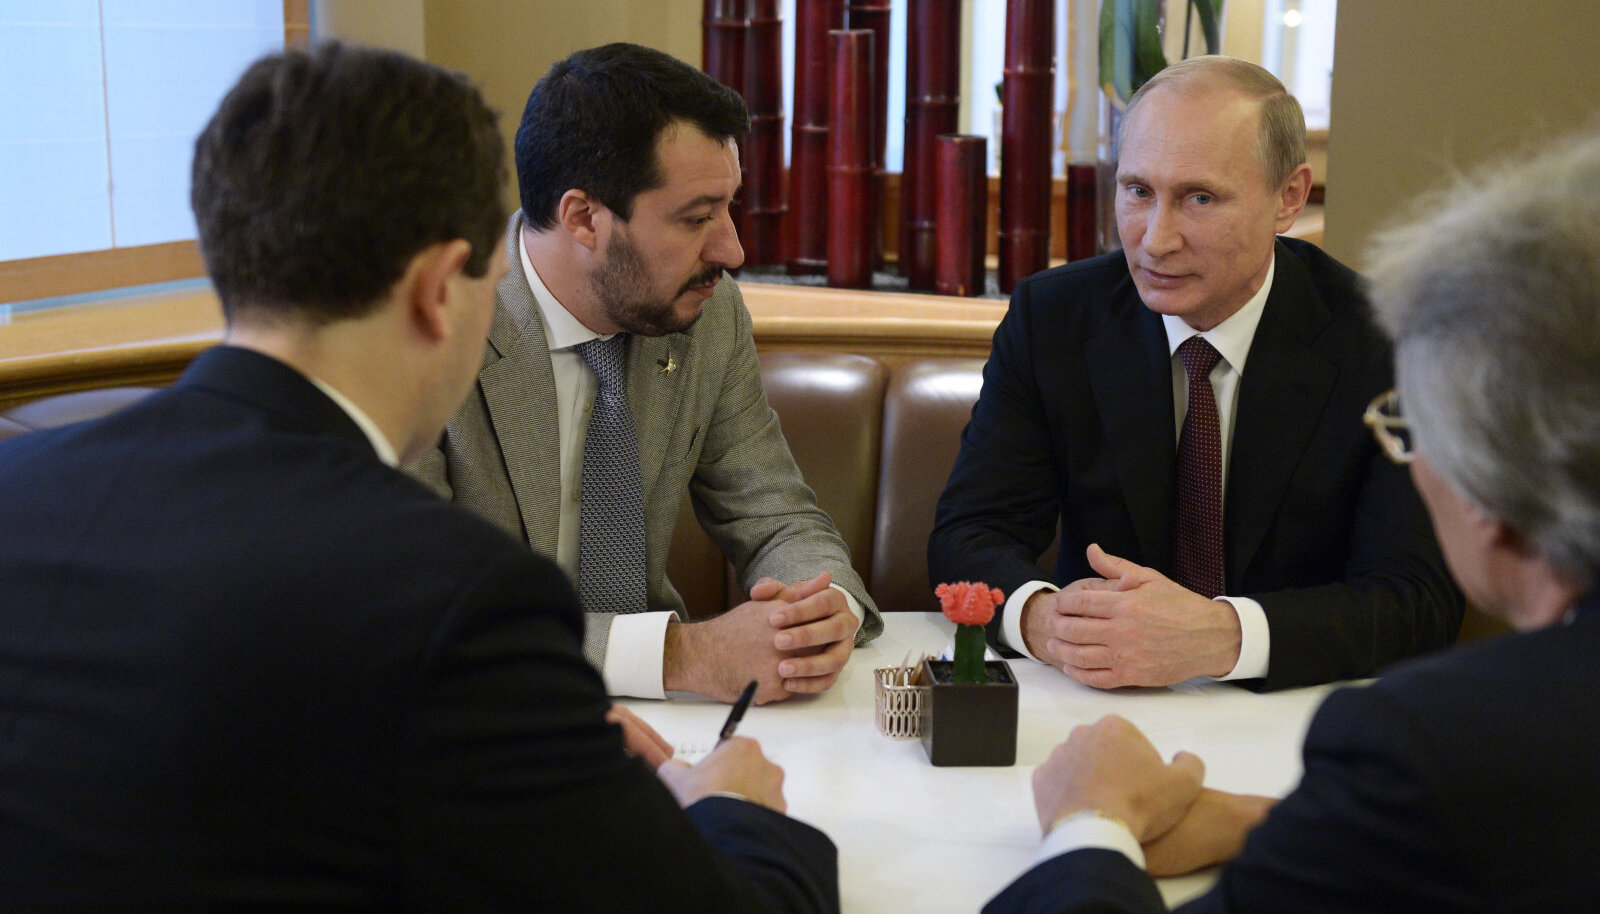 Matteo Salvini ja Valdimir Putin kohtumisel